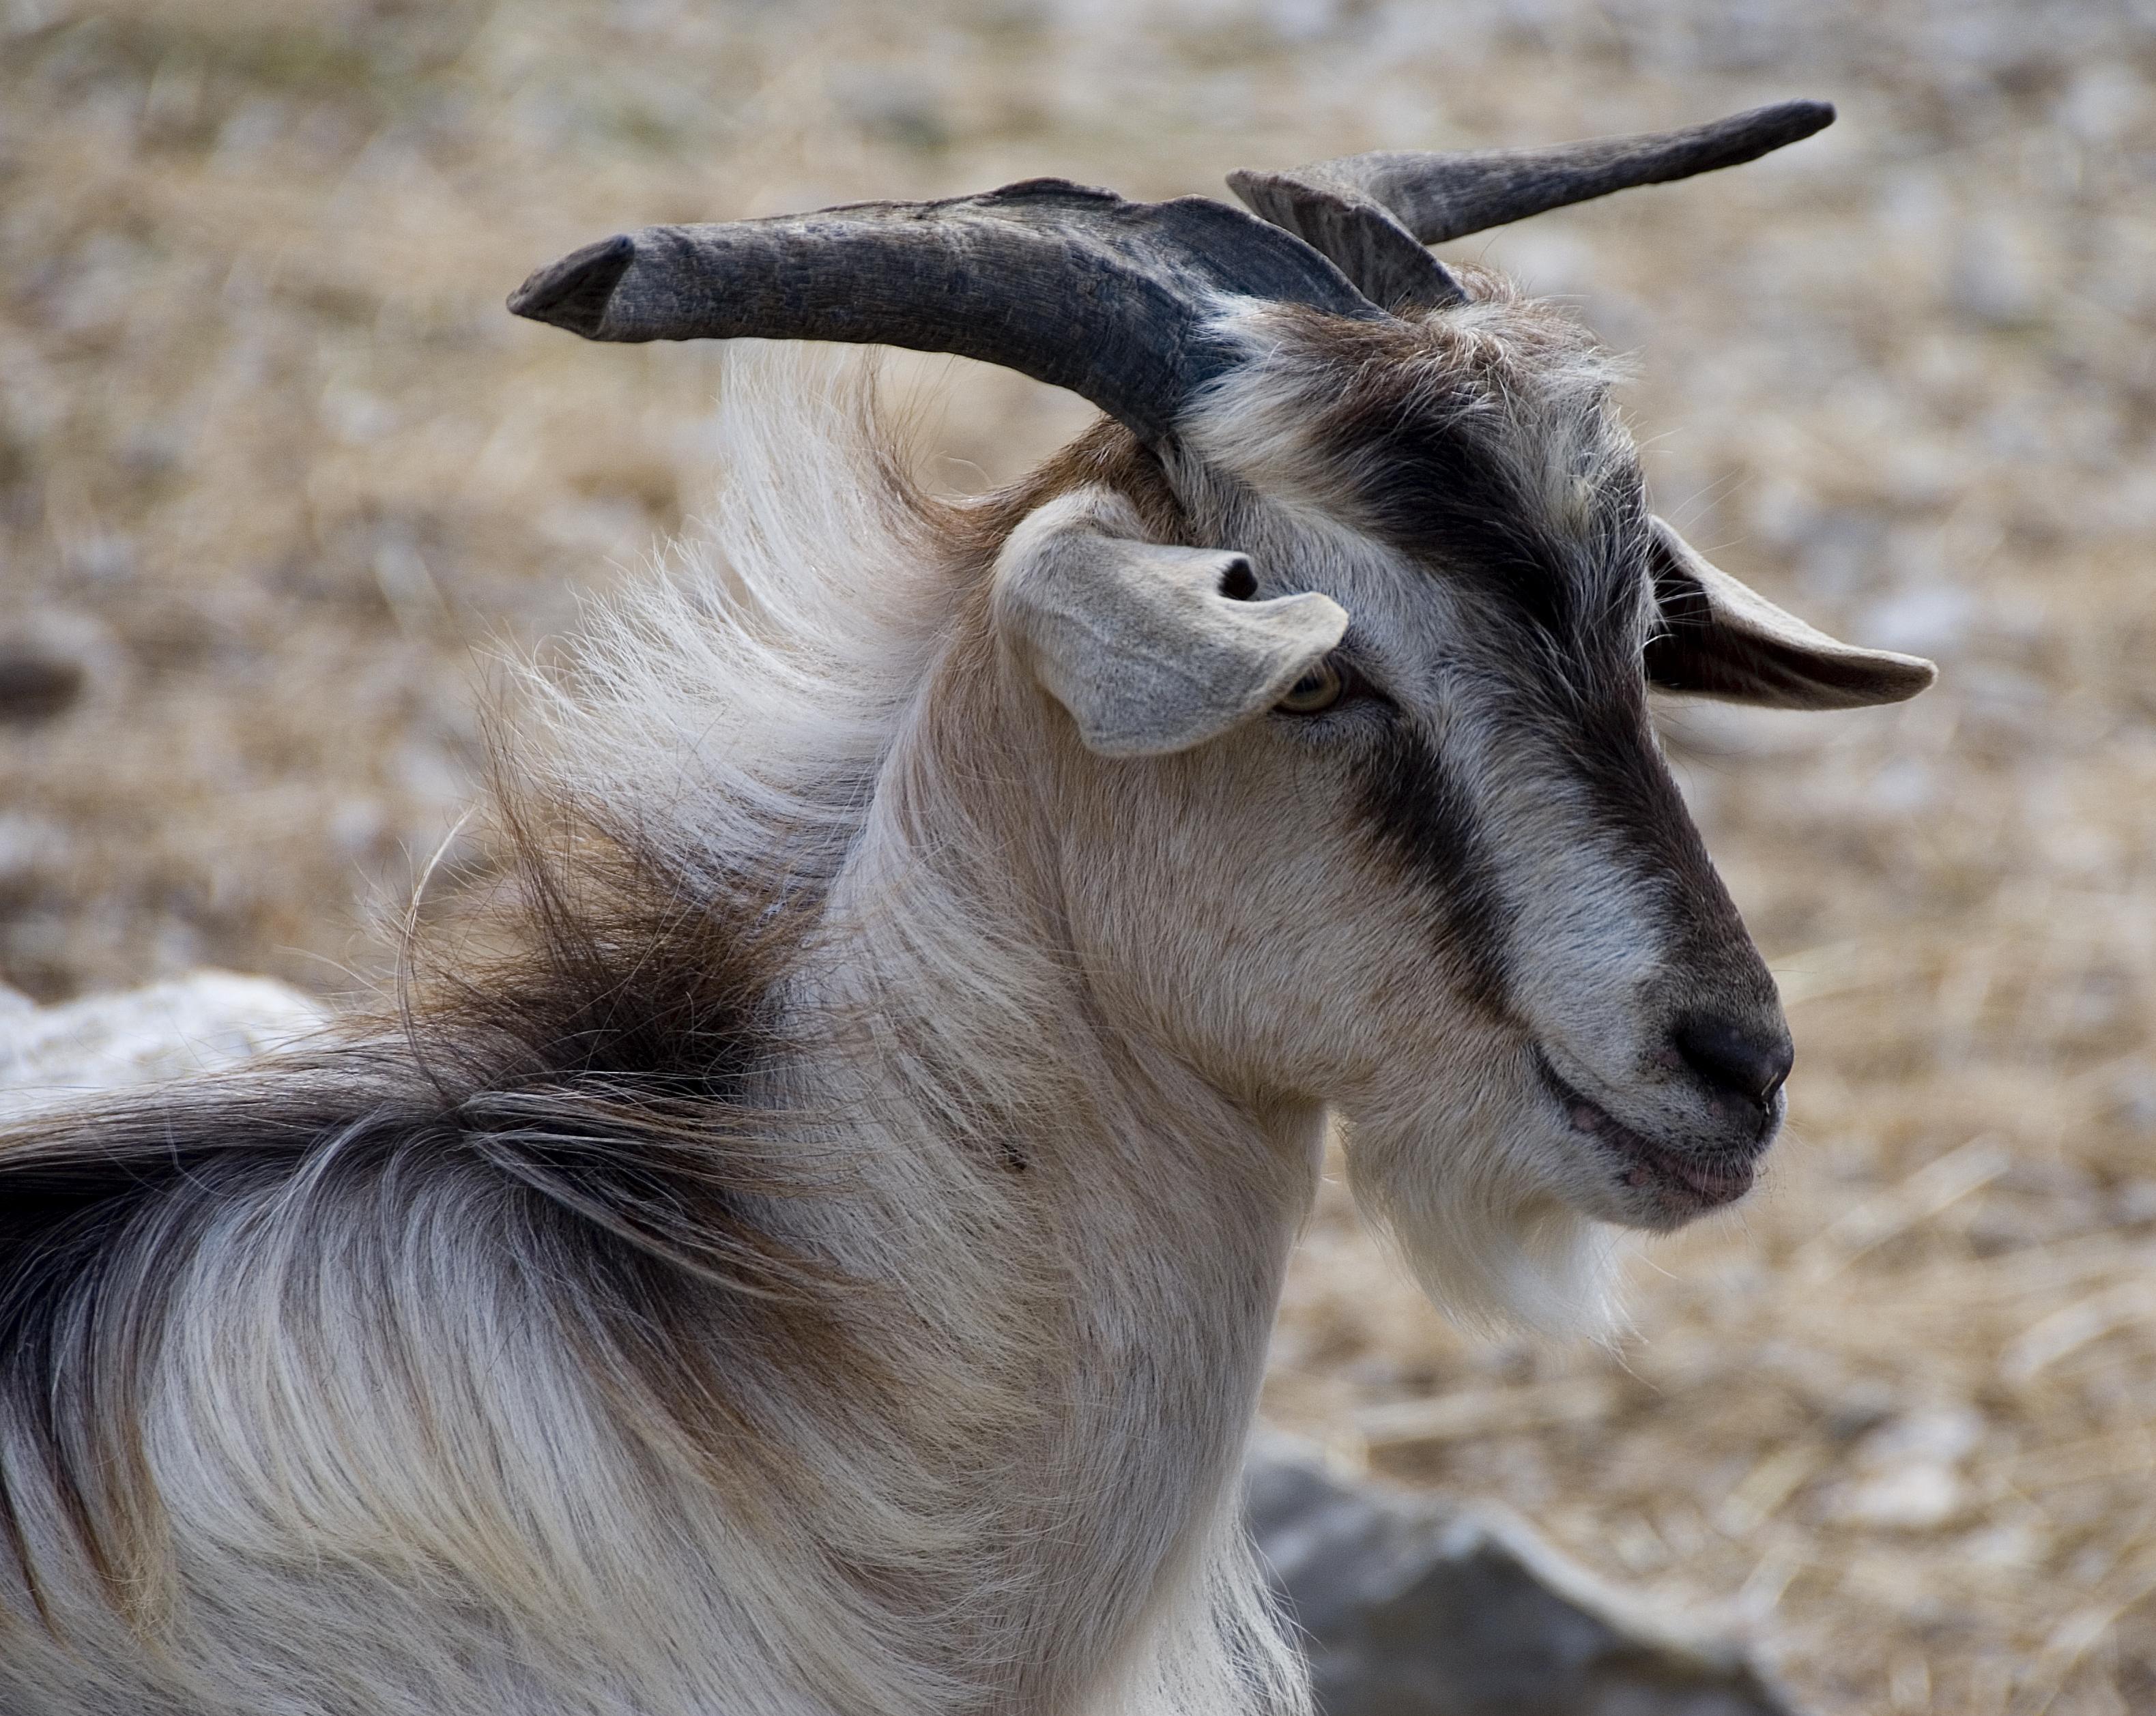 Goat - Kefallonia